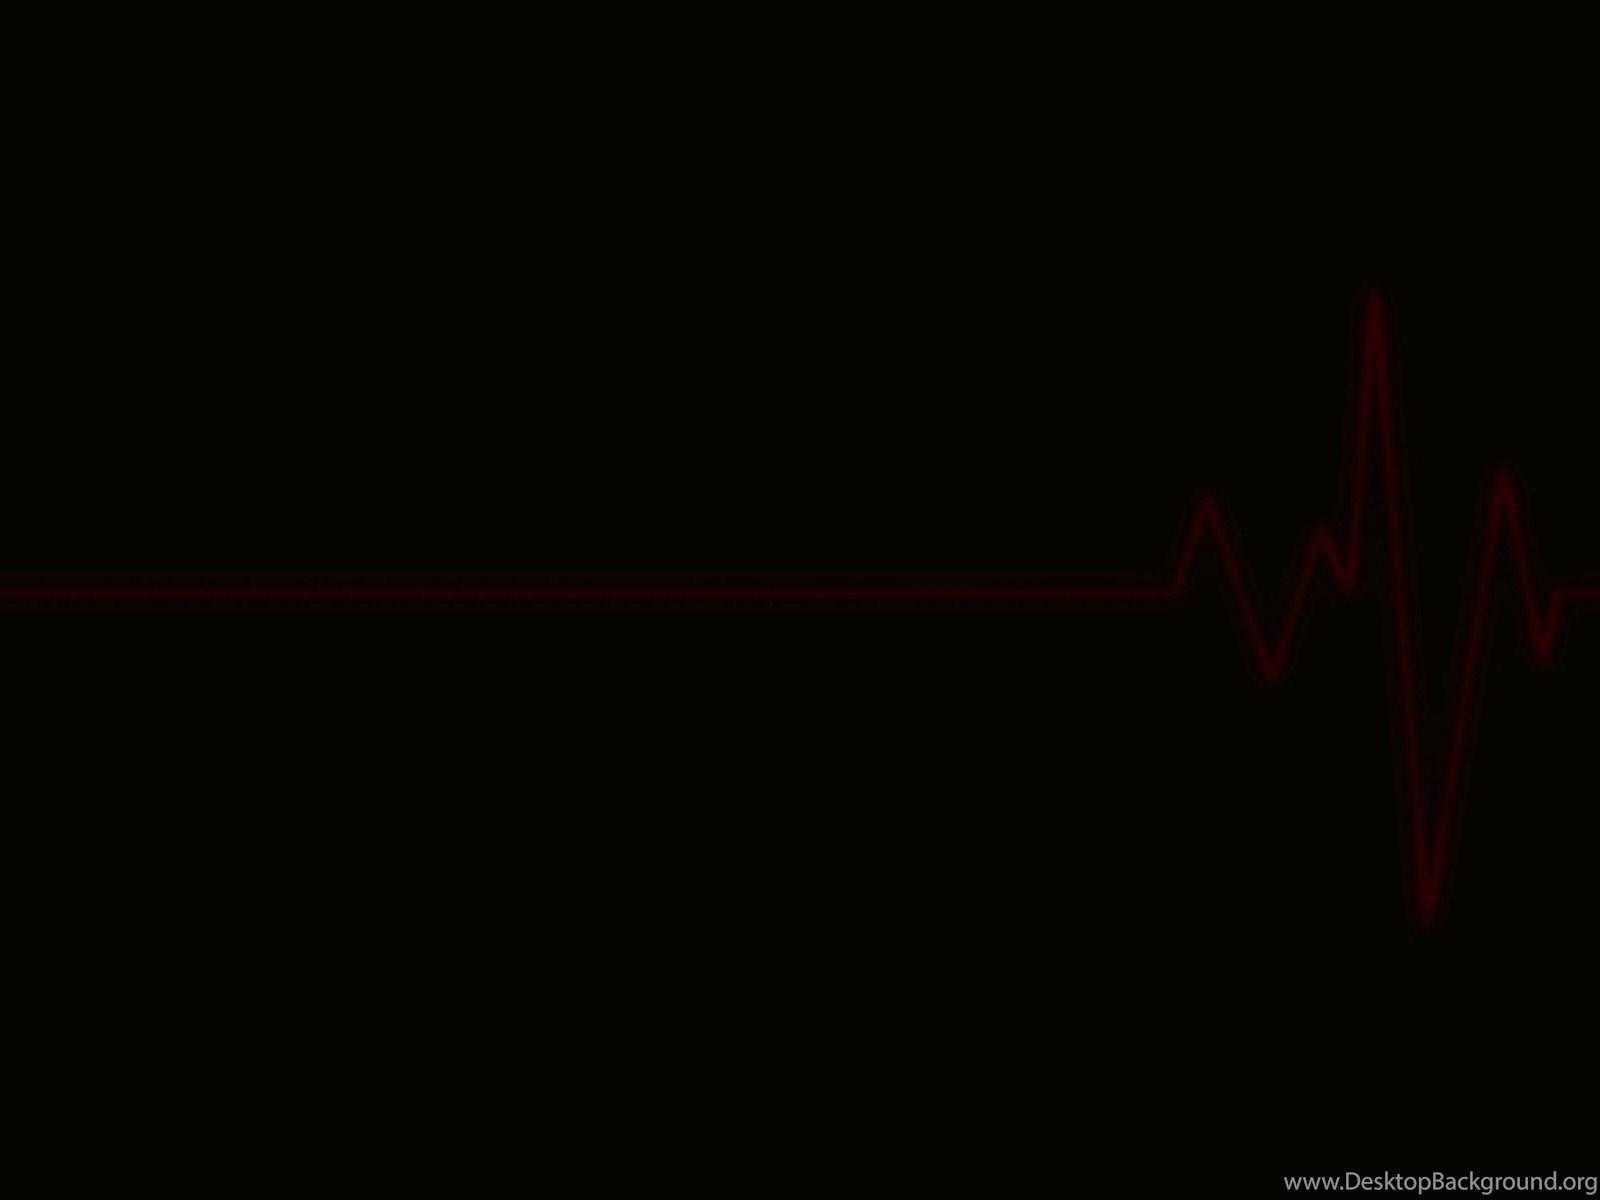 Image Hd Wallpapers Black Red Wallpaper Heart Beat Redblack Desktop Background